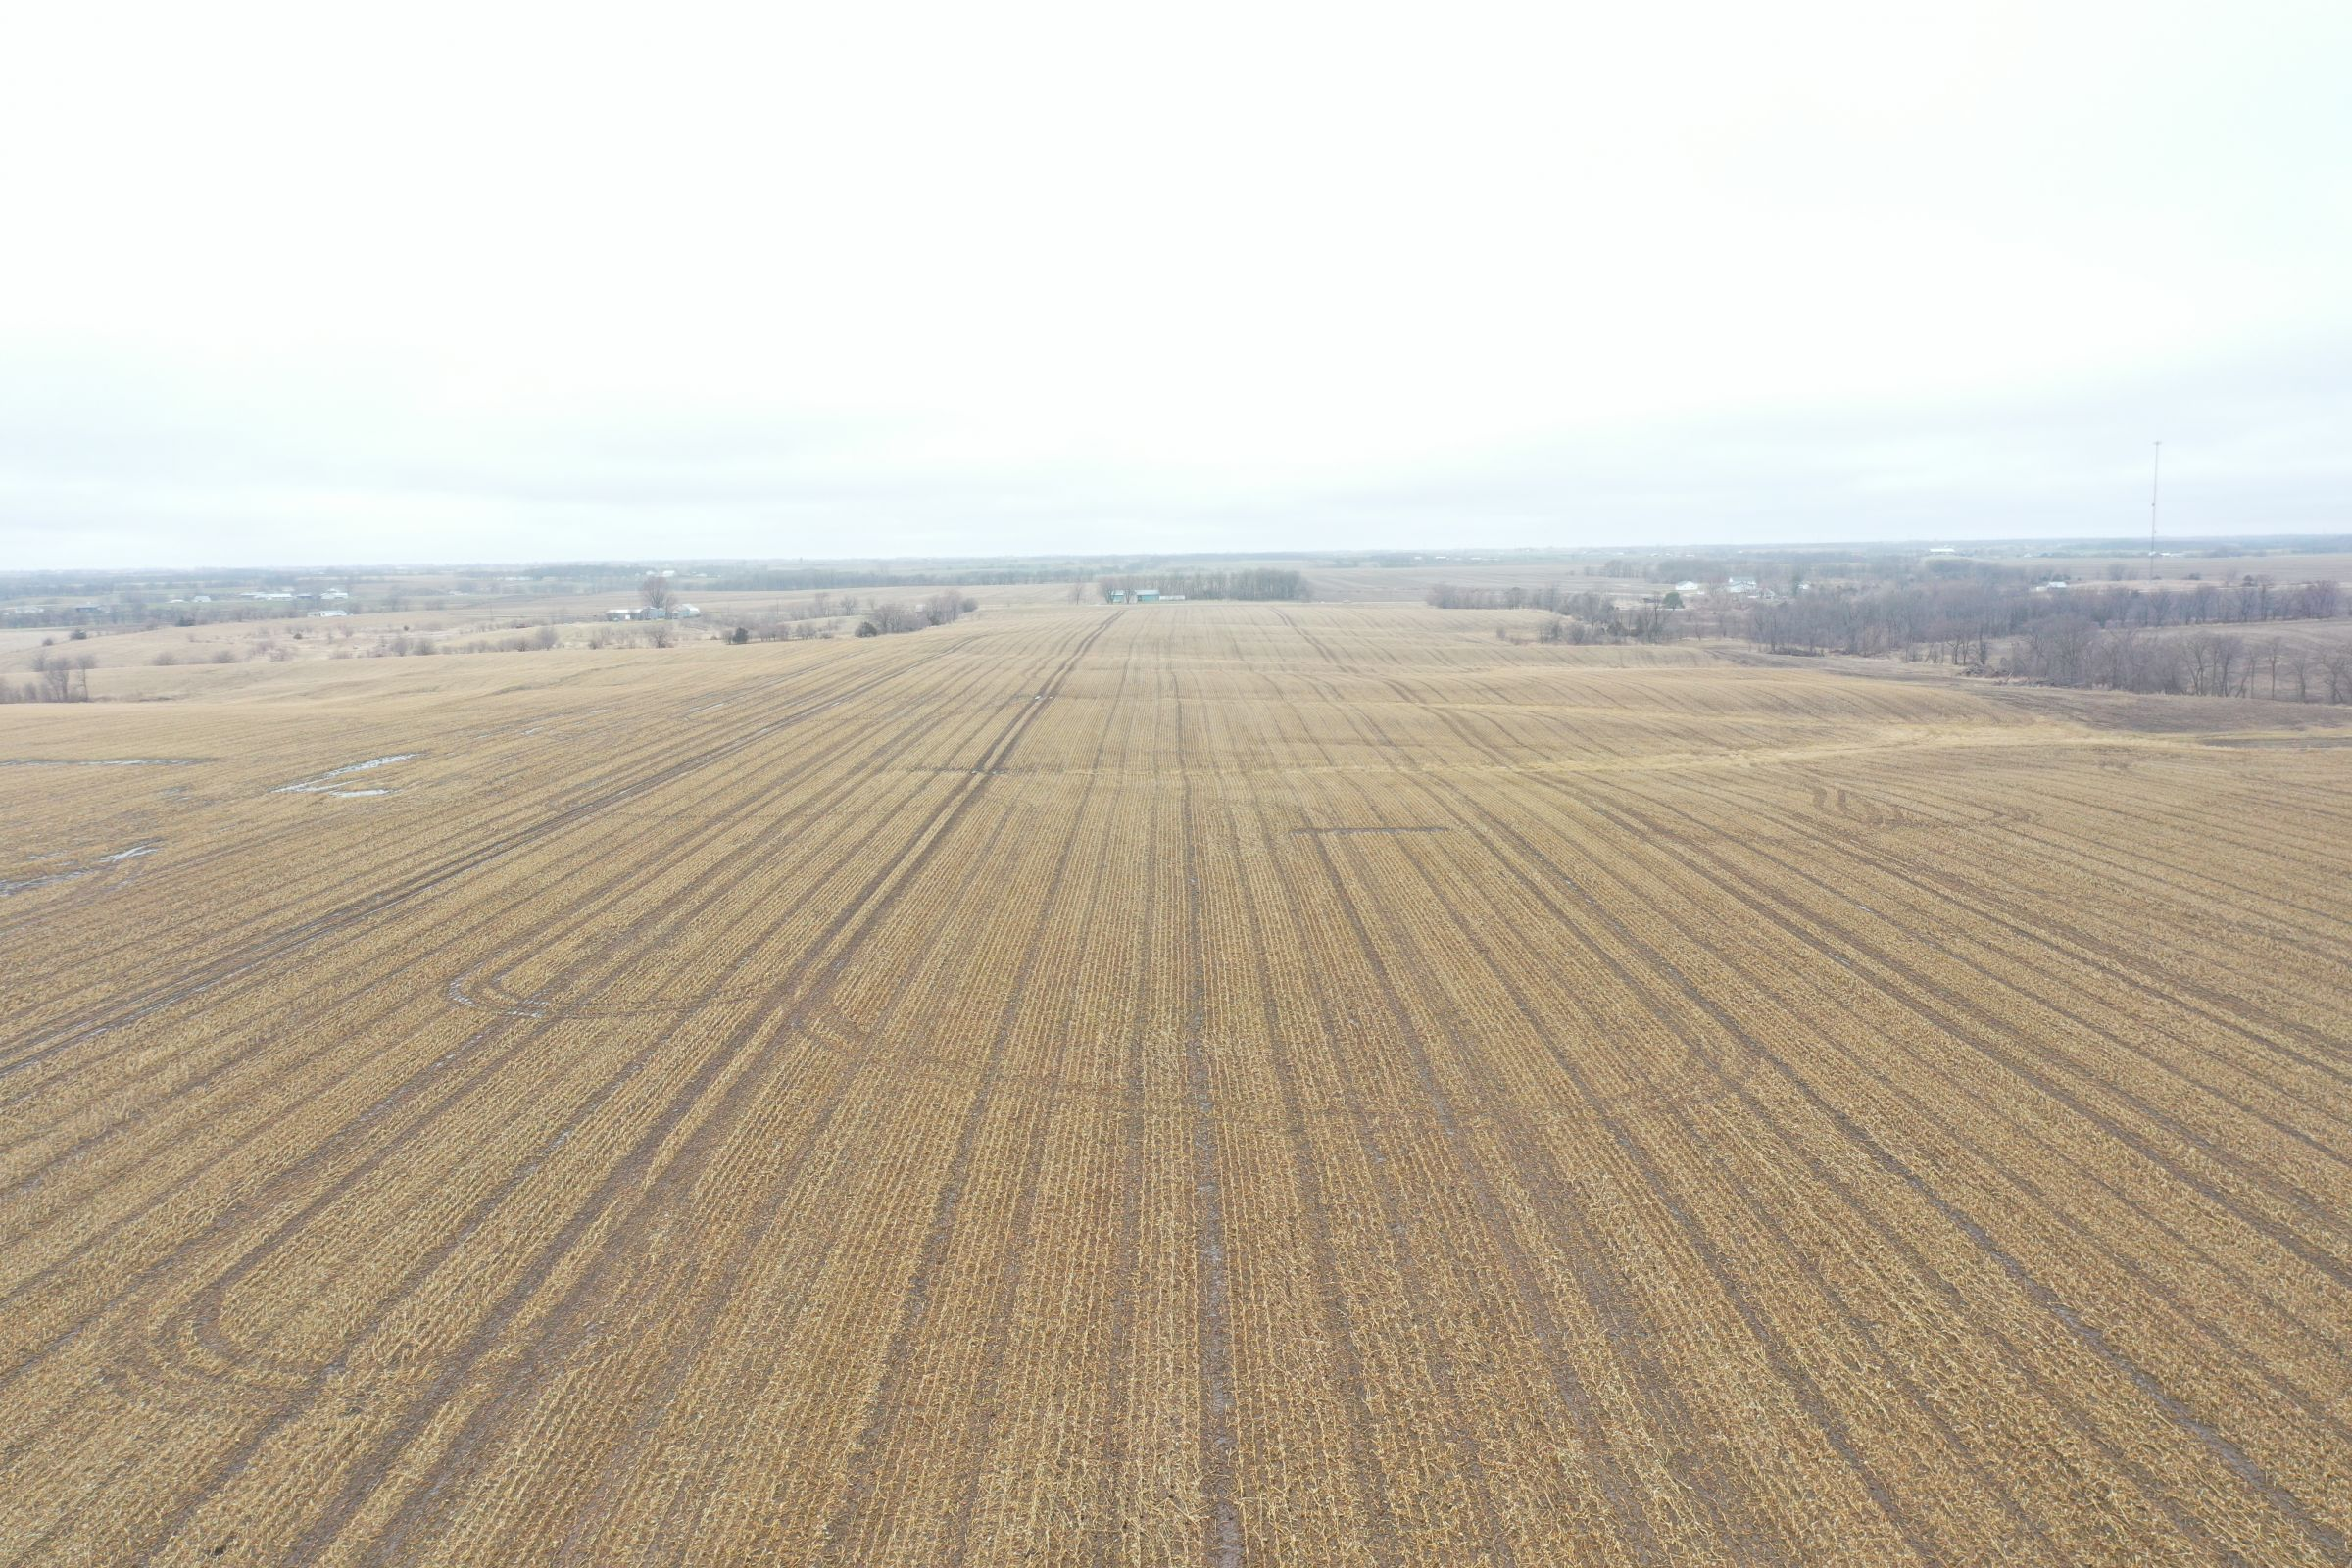 land-davis-county-iowa-180-acres-listing-number-15360-2-2021-03-19-143912.JPG